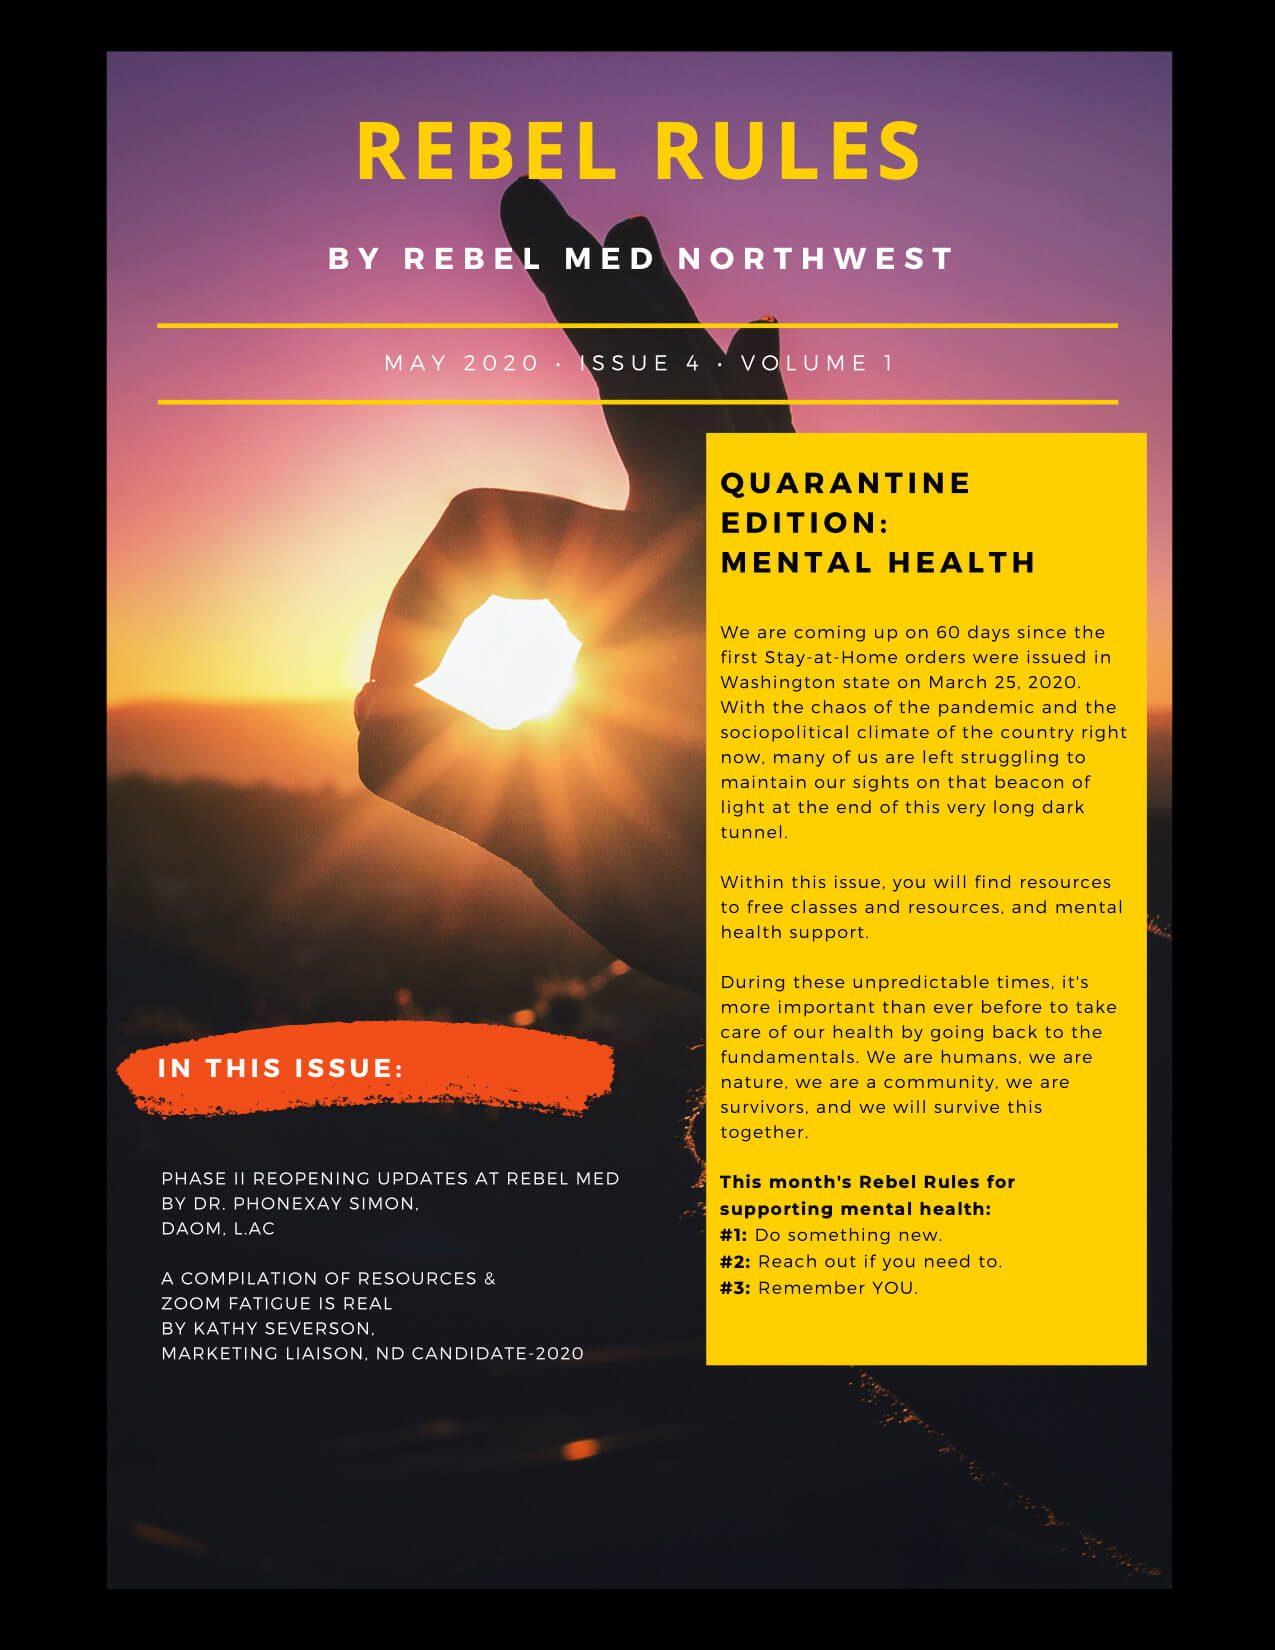 Rebel Rules, Rebel Med Nw, Naturopathic Medicine, Acupuncture, Alternative Medicine, Covid-19, Quarantine, Pandemic, Coronavirus